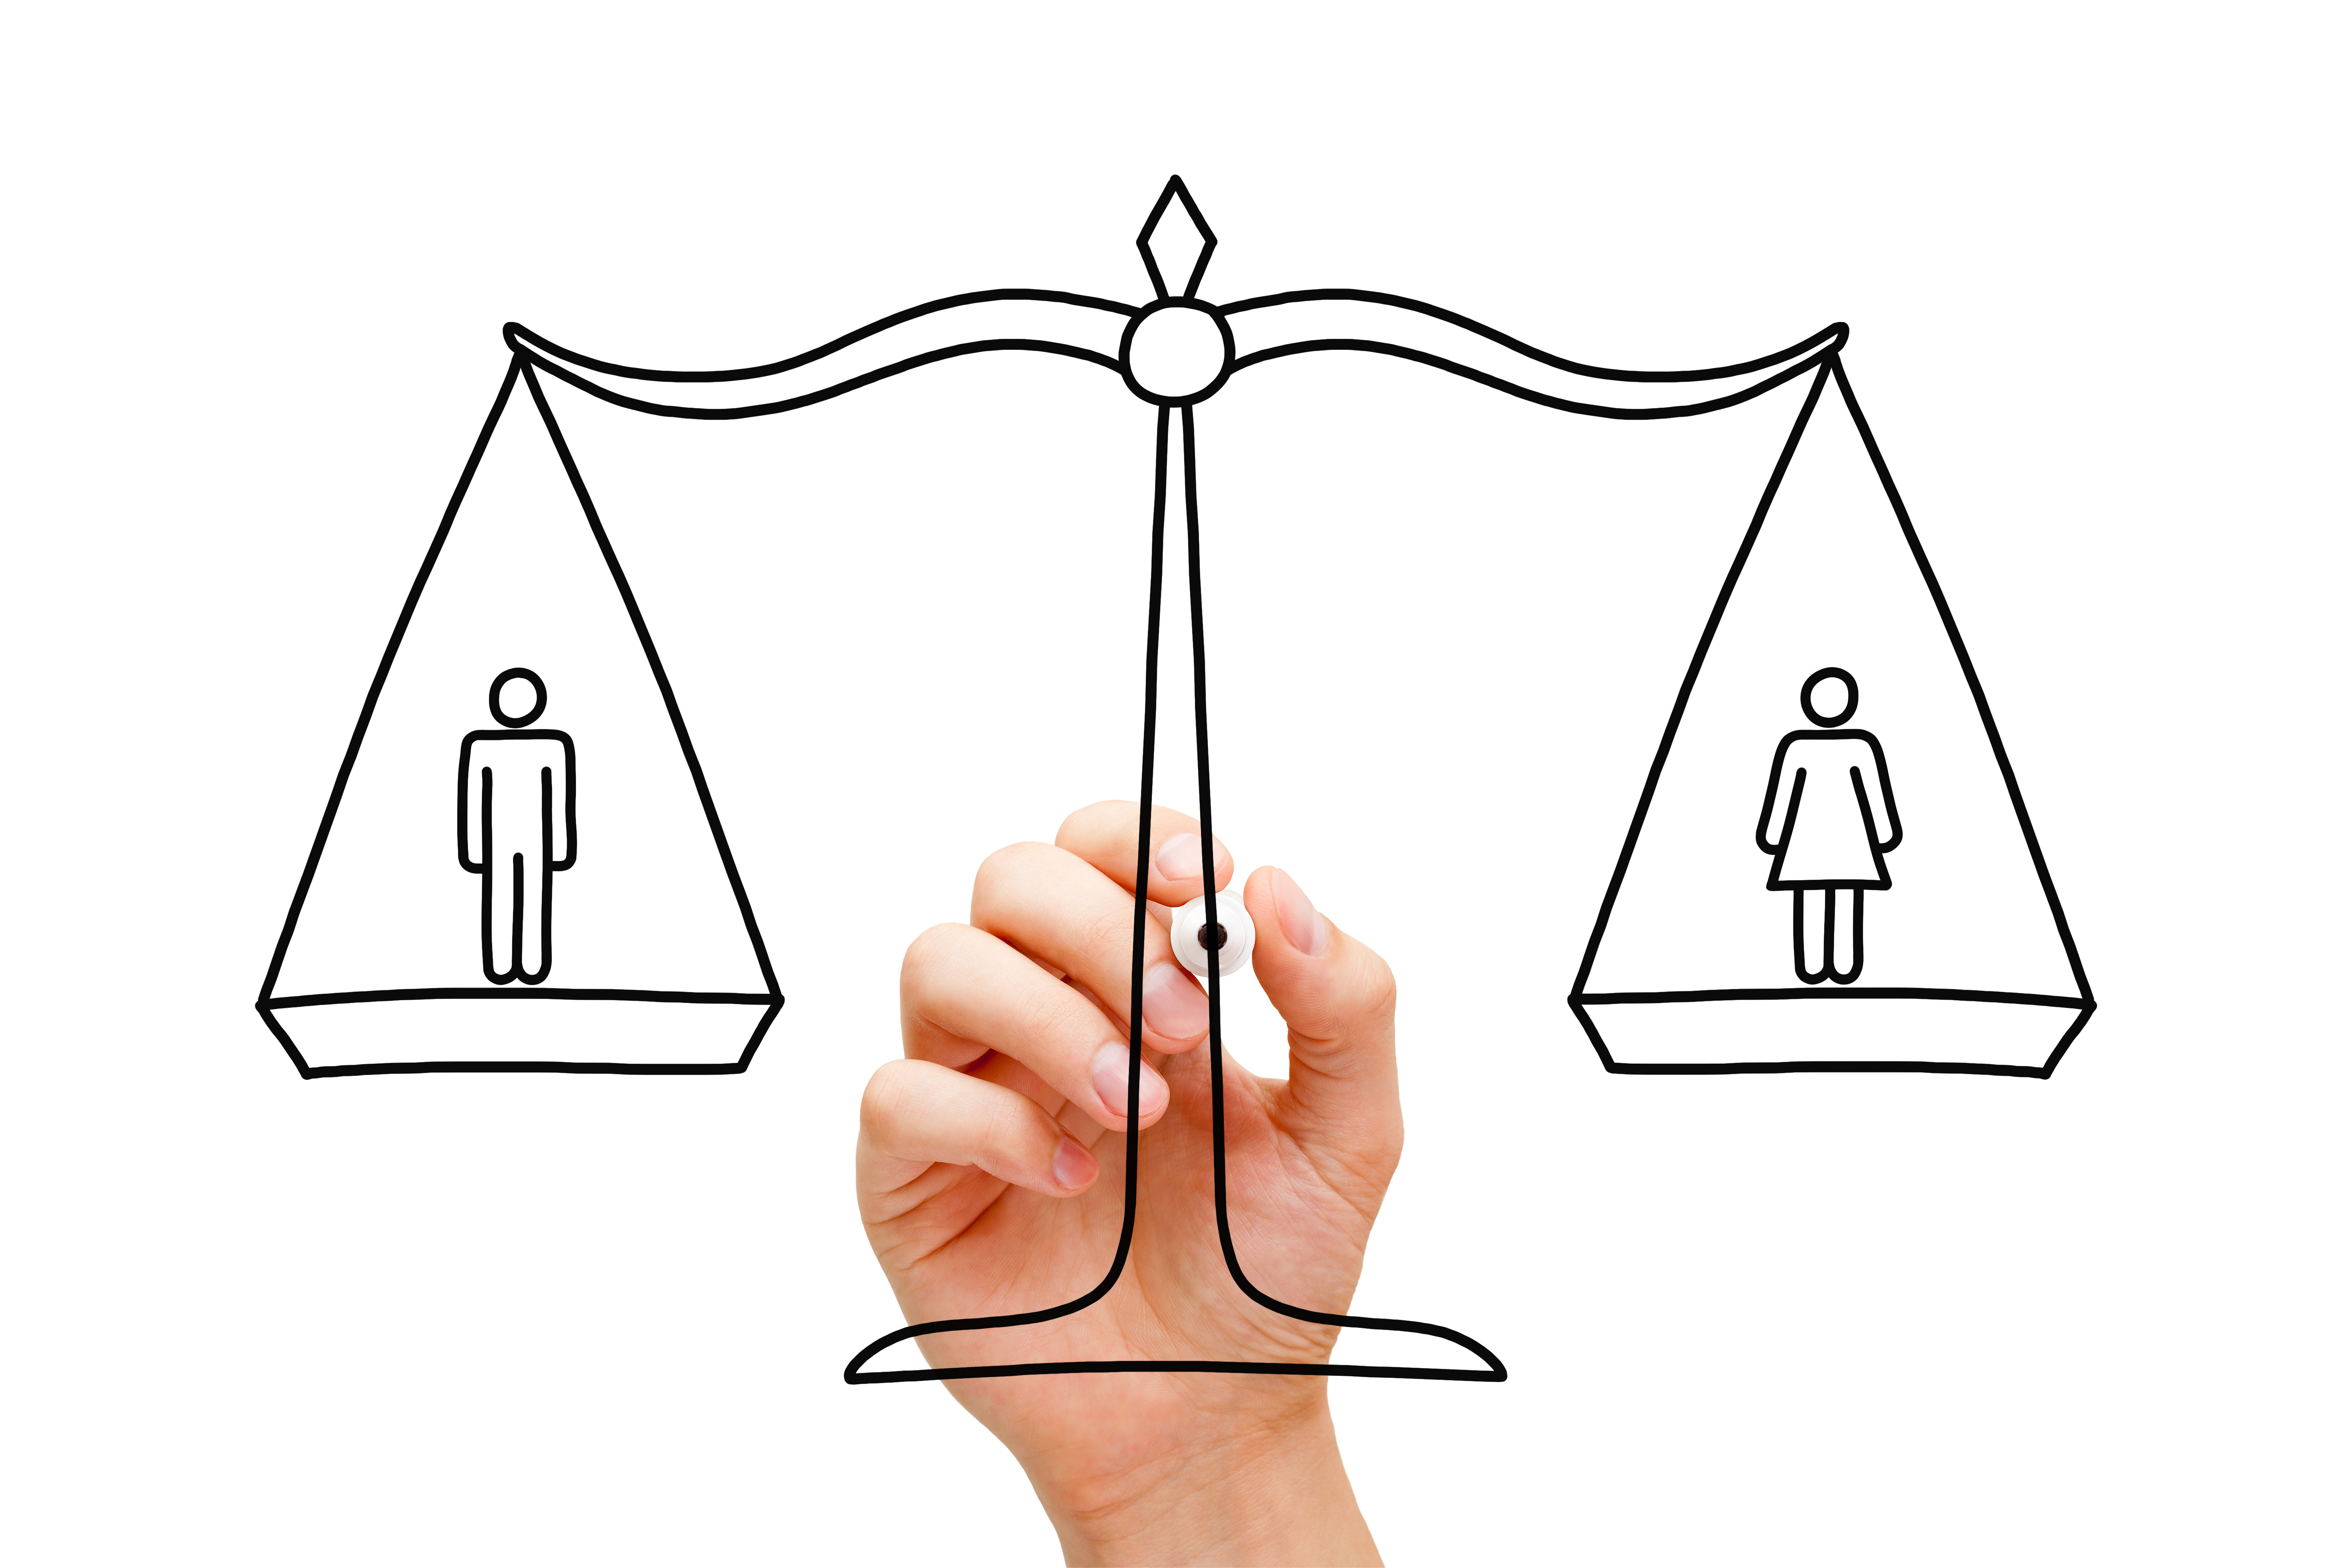 Nytt jämställdhetsprojekt